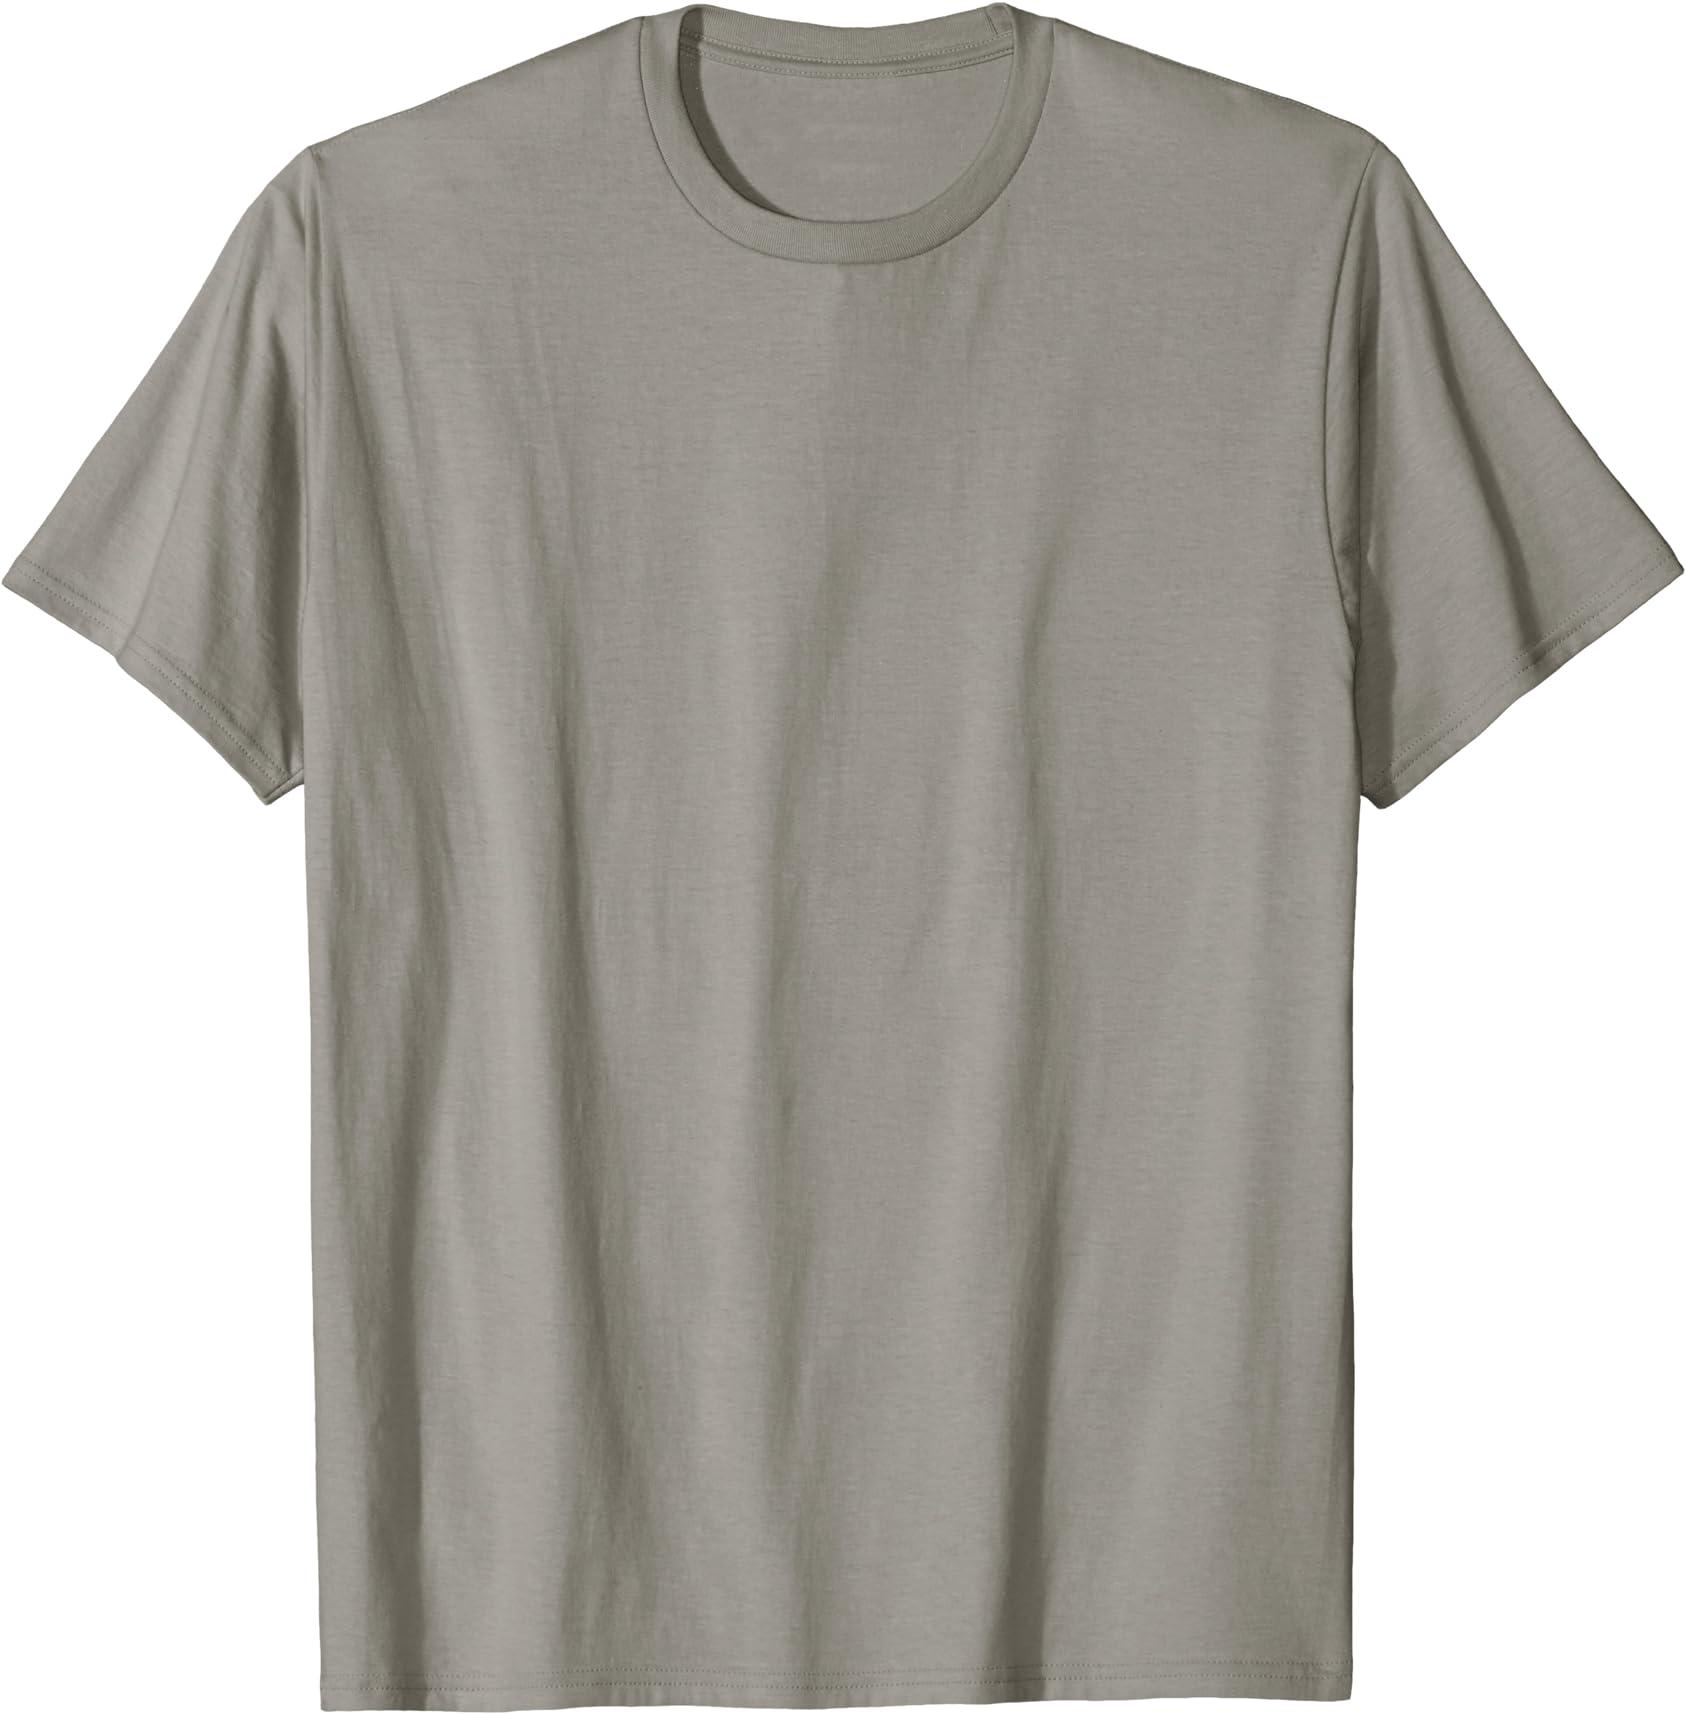 Long Sleeve Shirt LookPink Great Dane Mama Tee Shirt Design